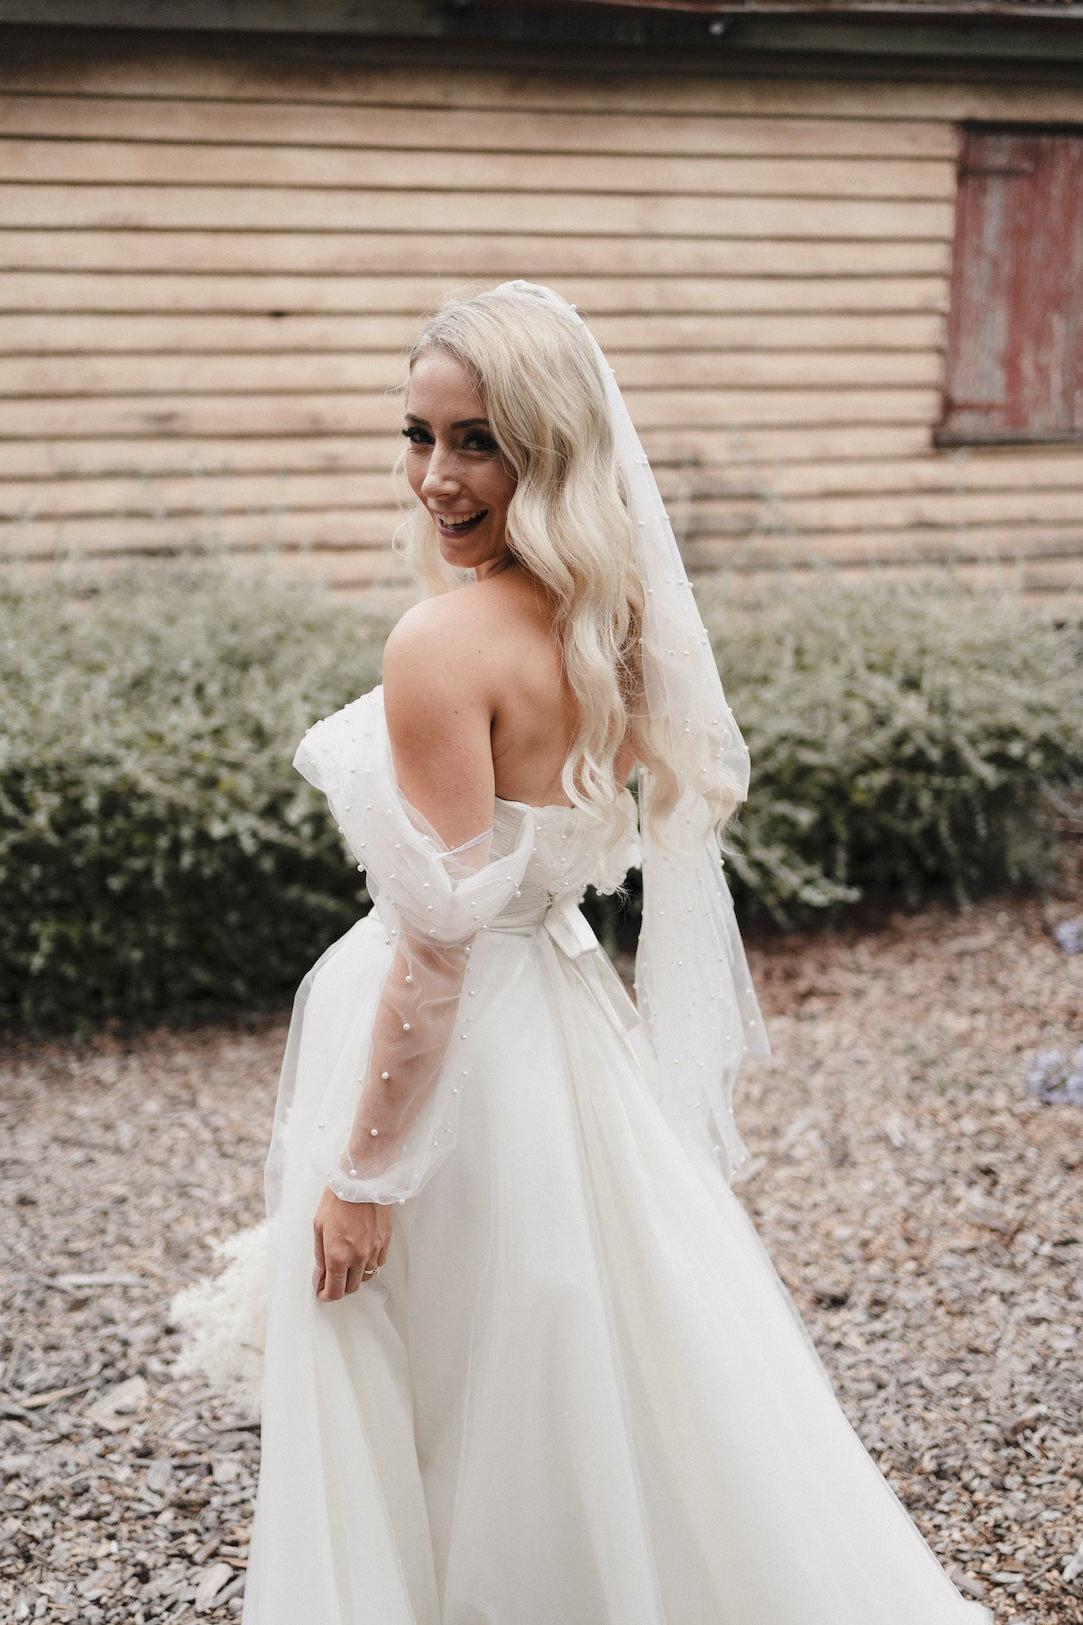 Bride posing in dress